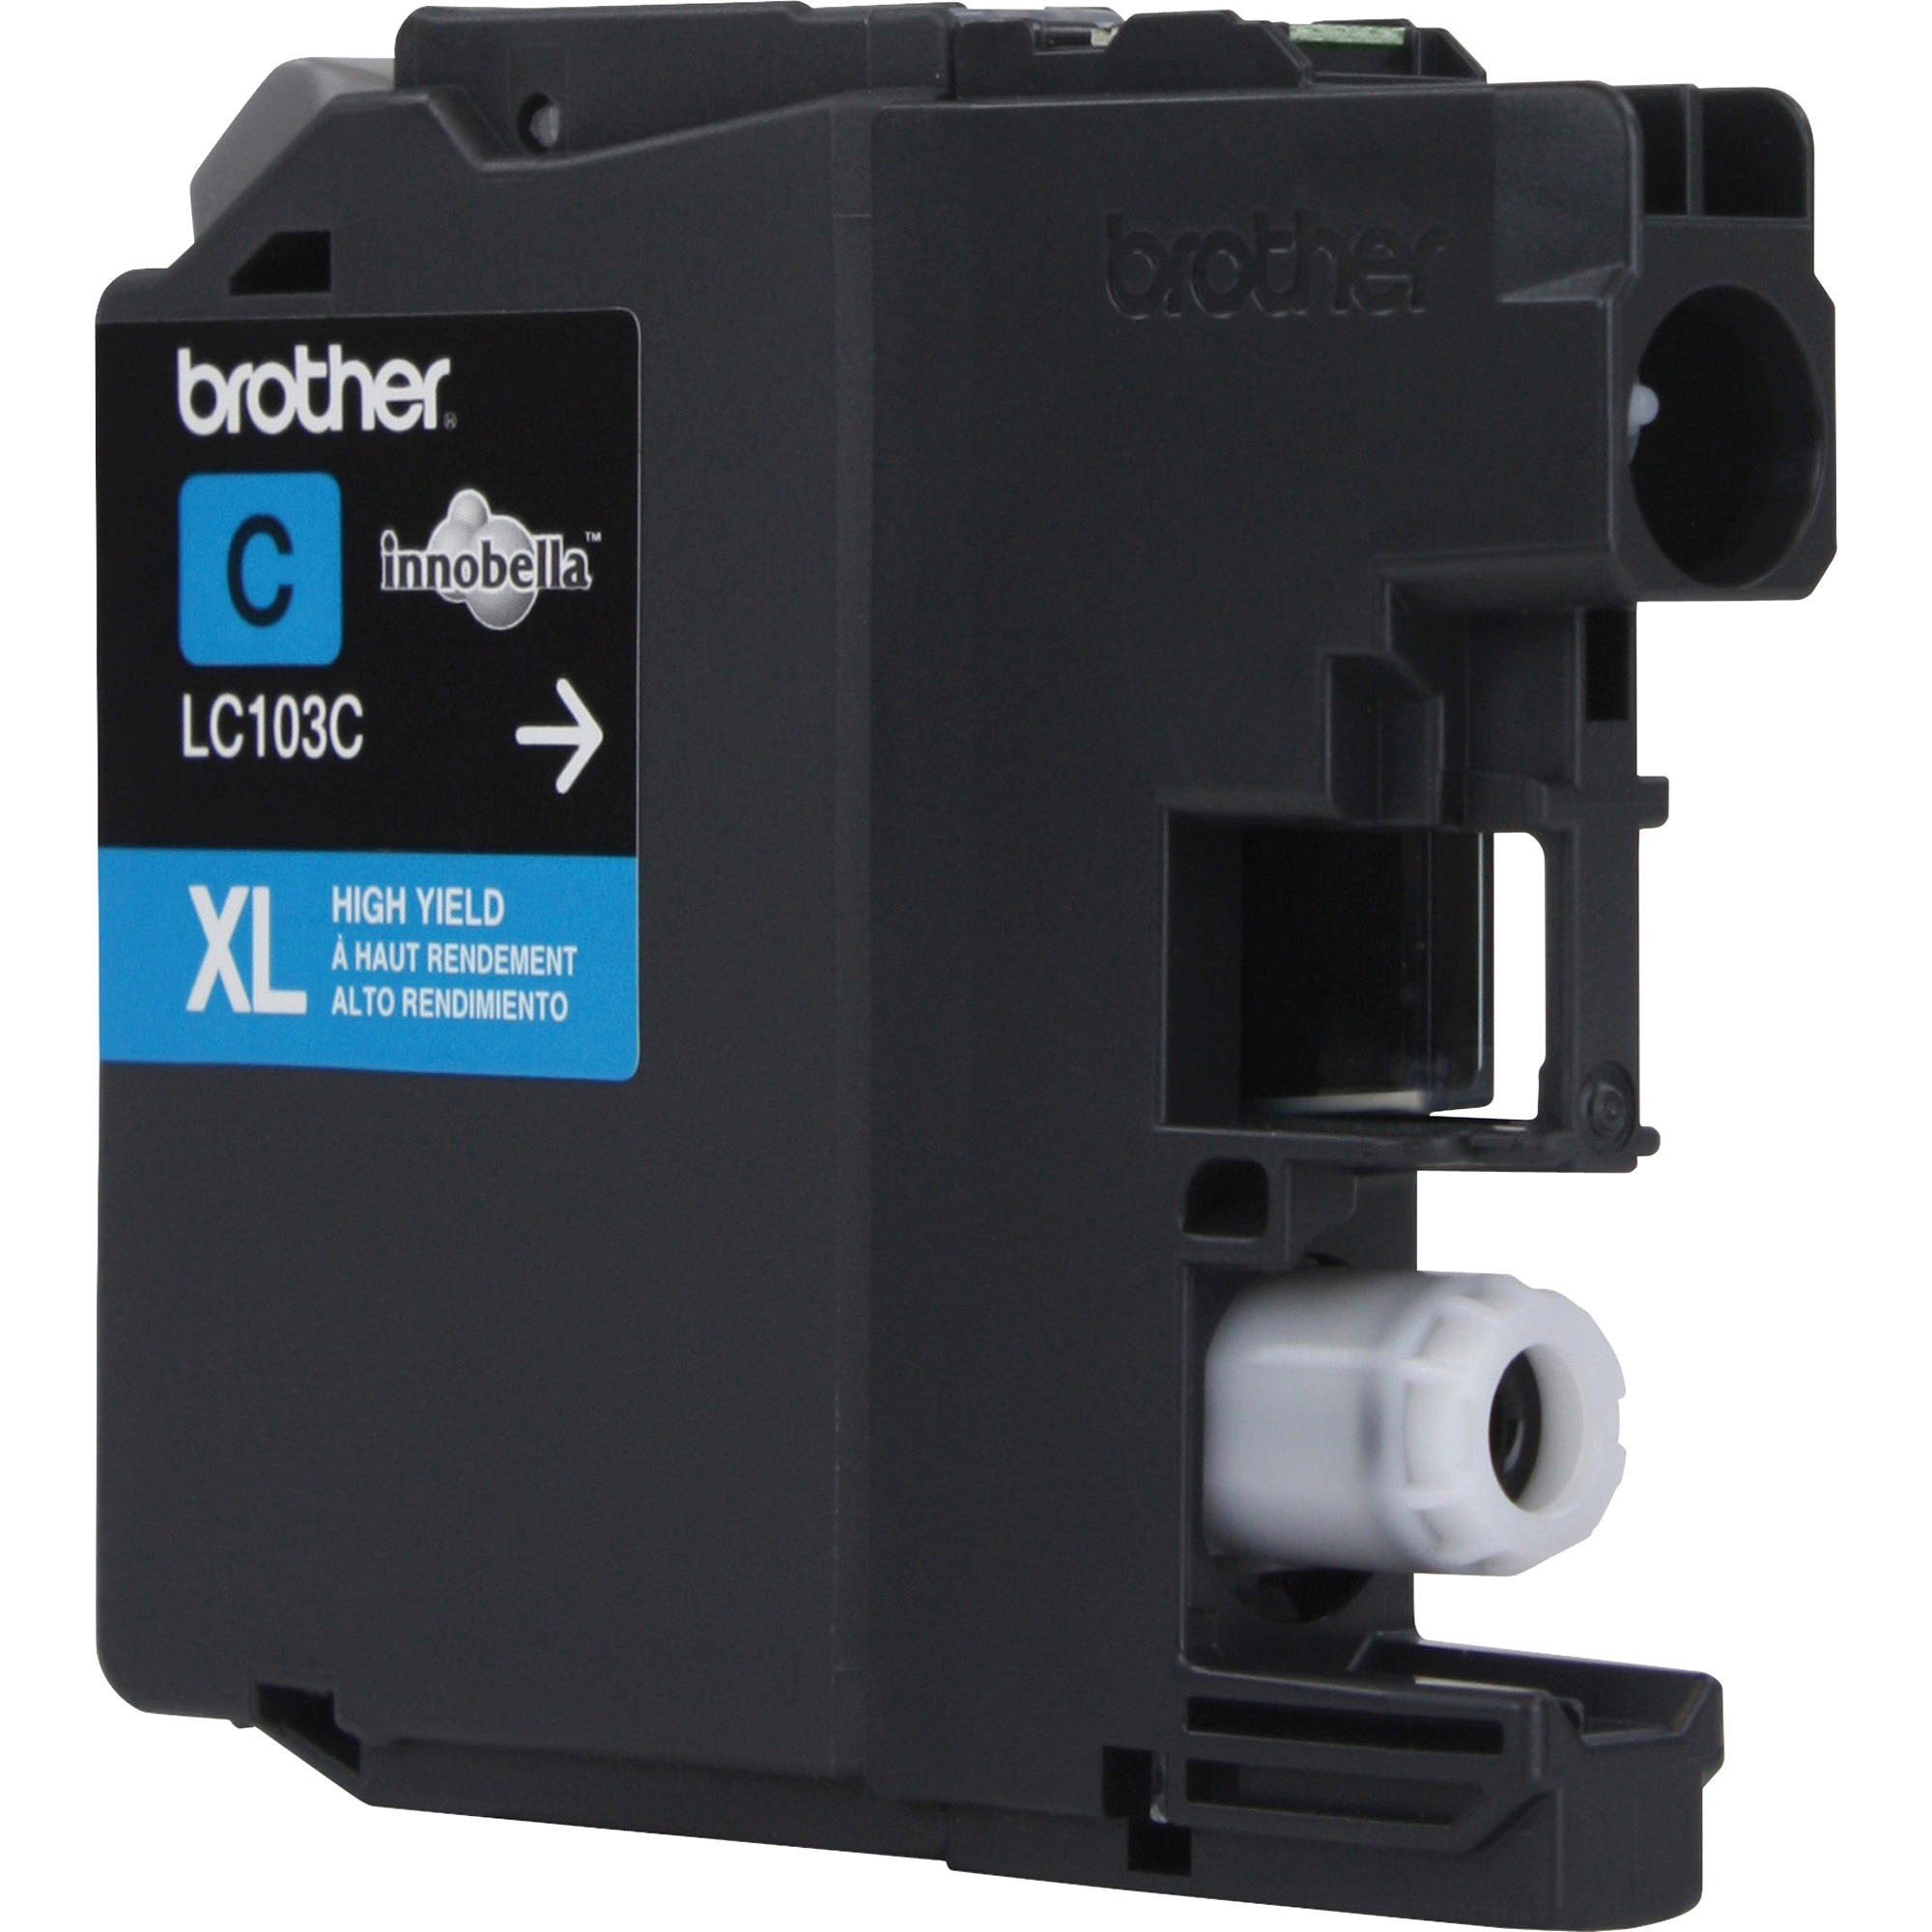 Brother Innobella LC103C Ink Cartridge